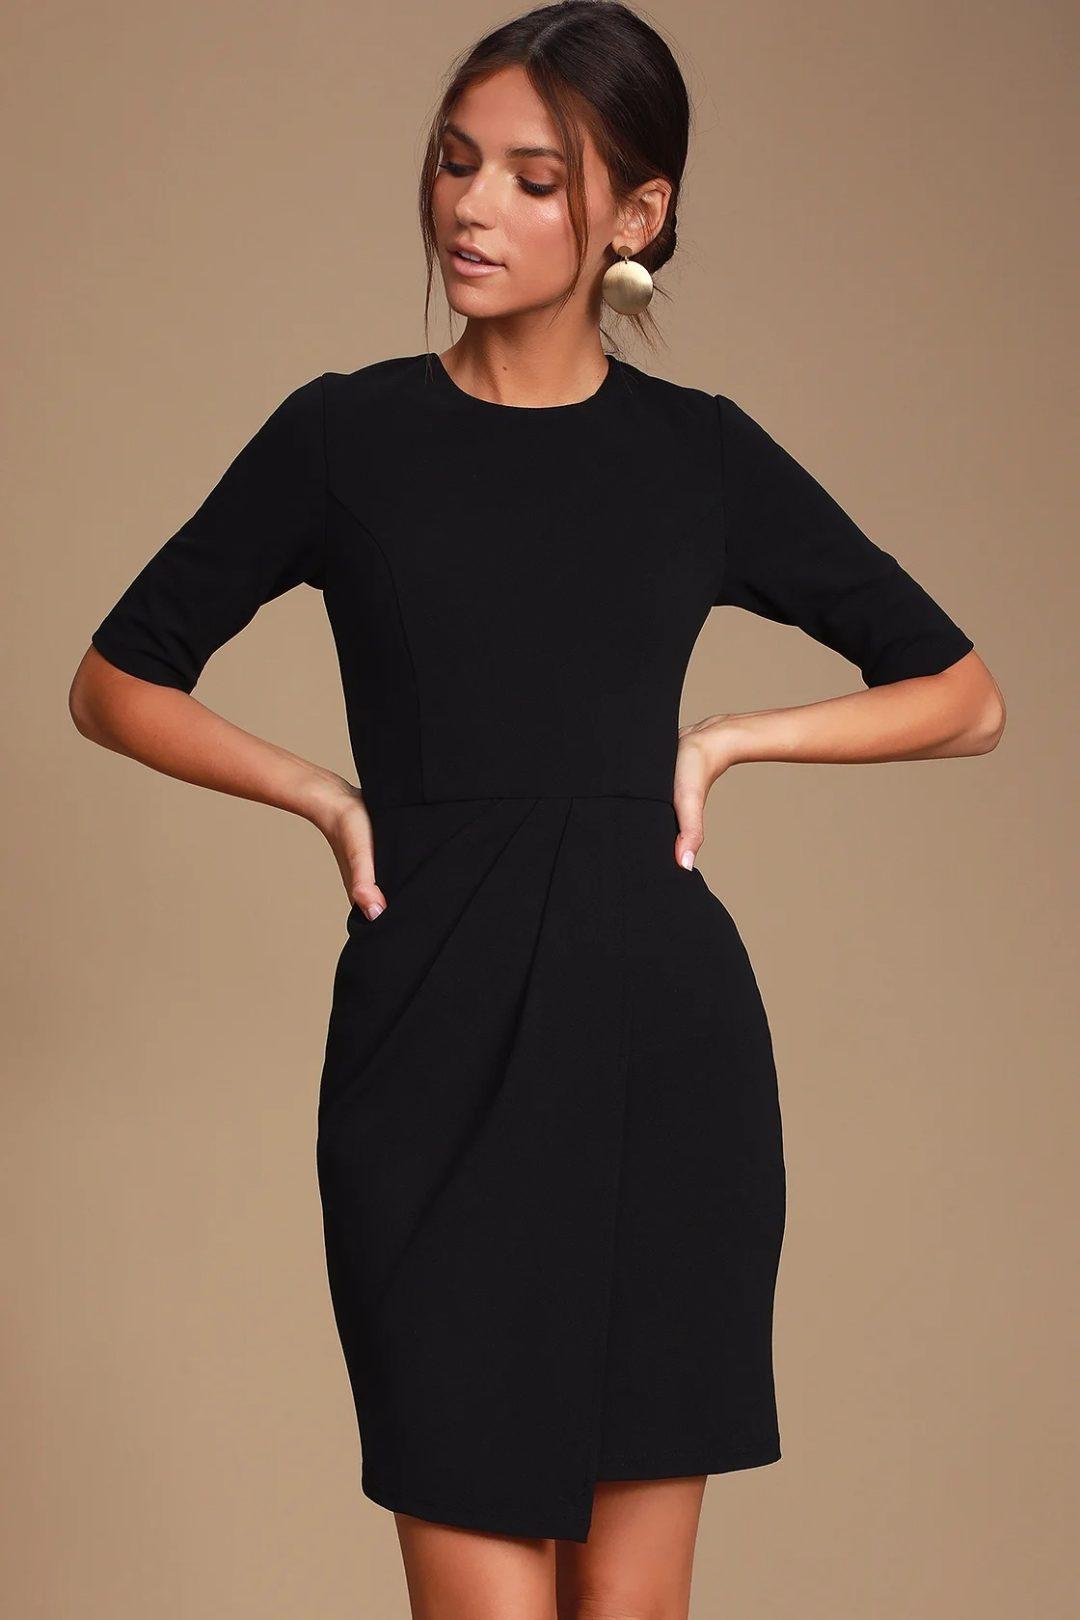 Simple black sheath dress for court